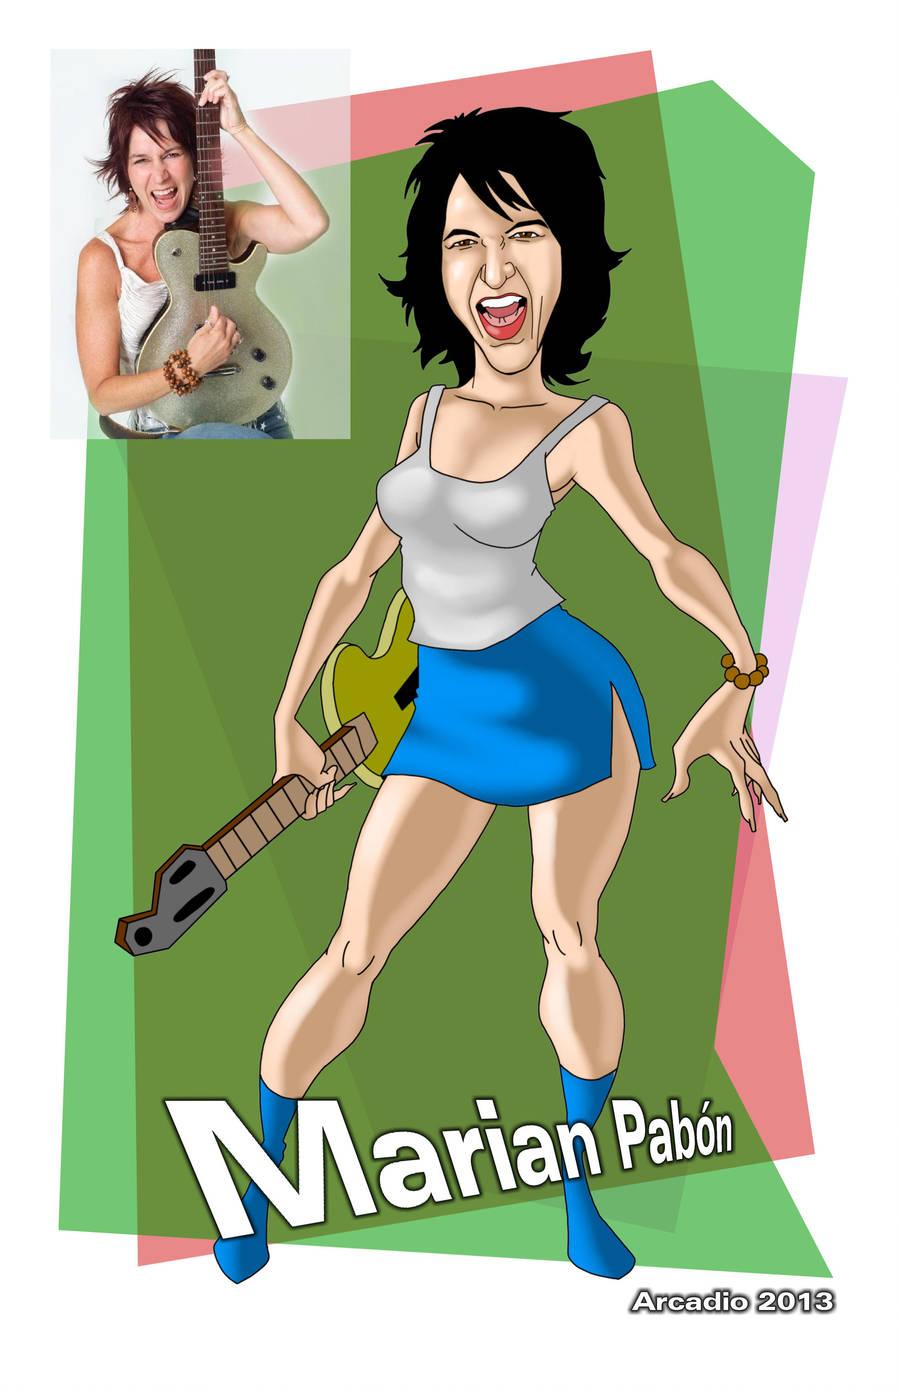 Marian Pabon Marian Pabon new photo